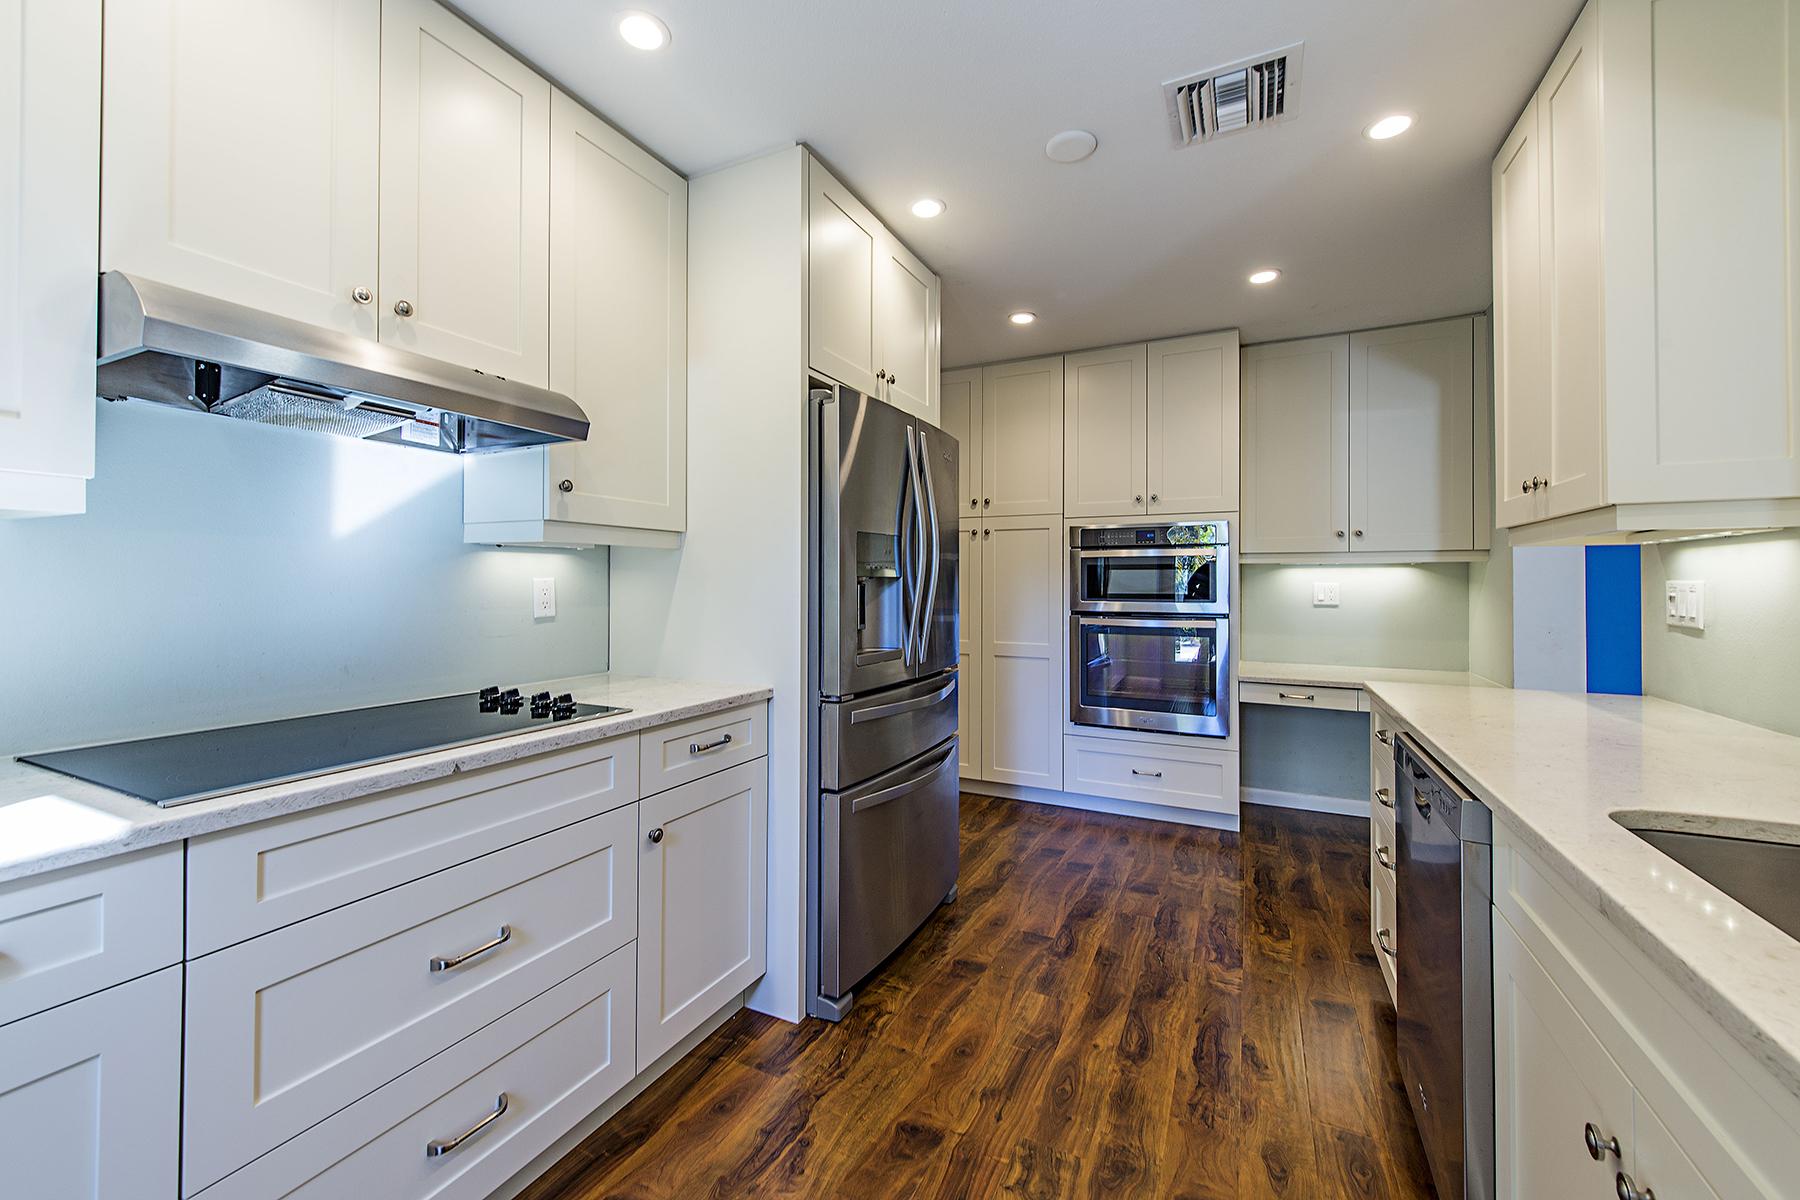 Single Family Home for Sale at BONITA PARK 27616 Lime St Bonita Springs, Florida, 34135 United States